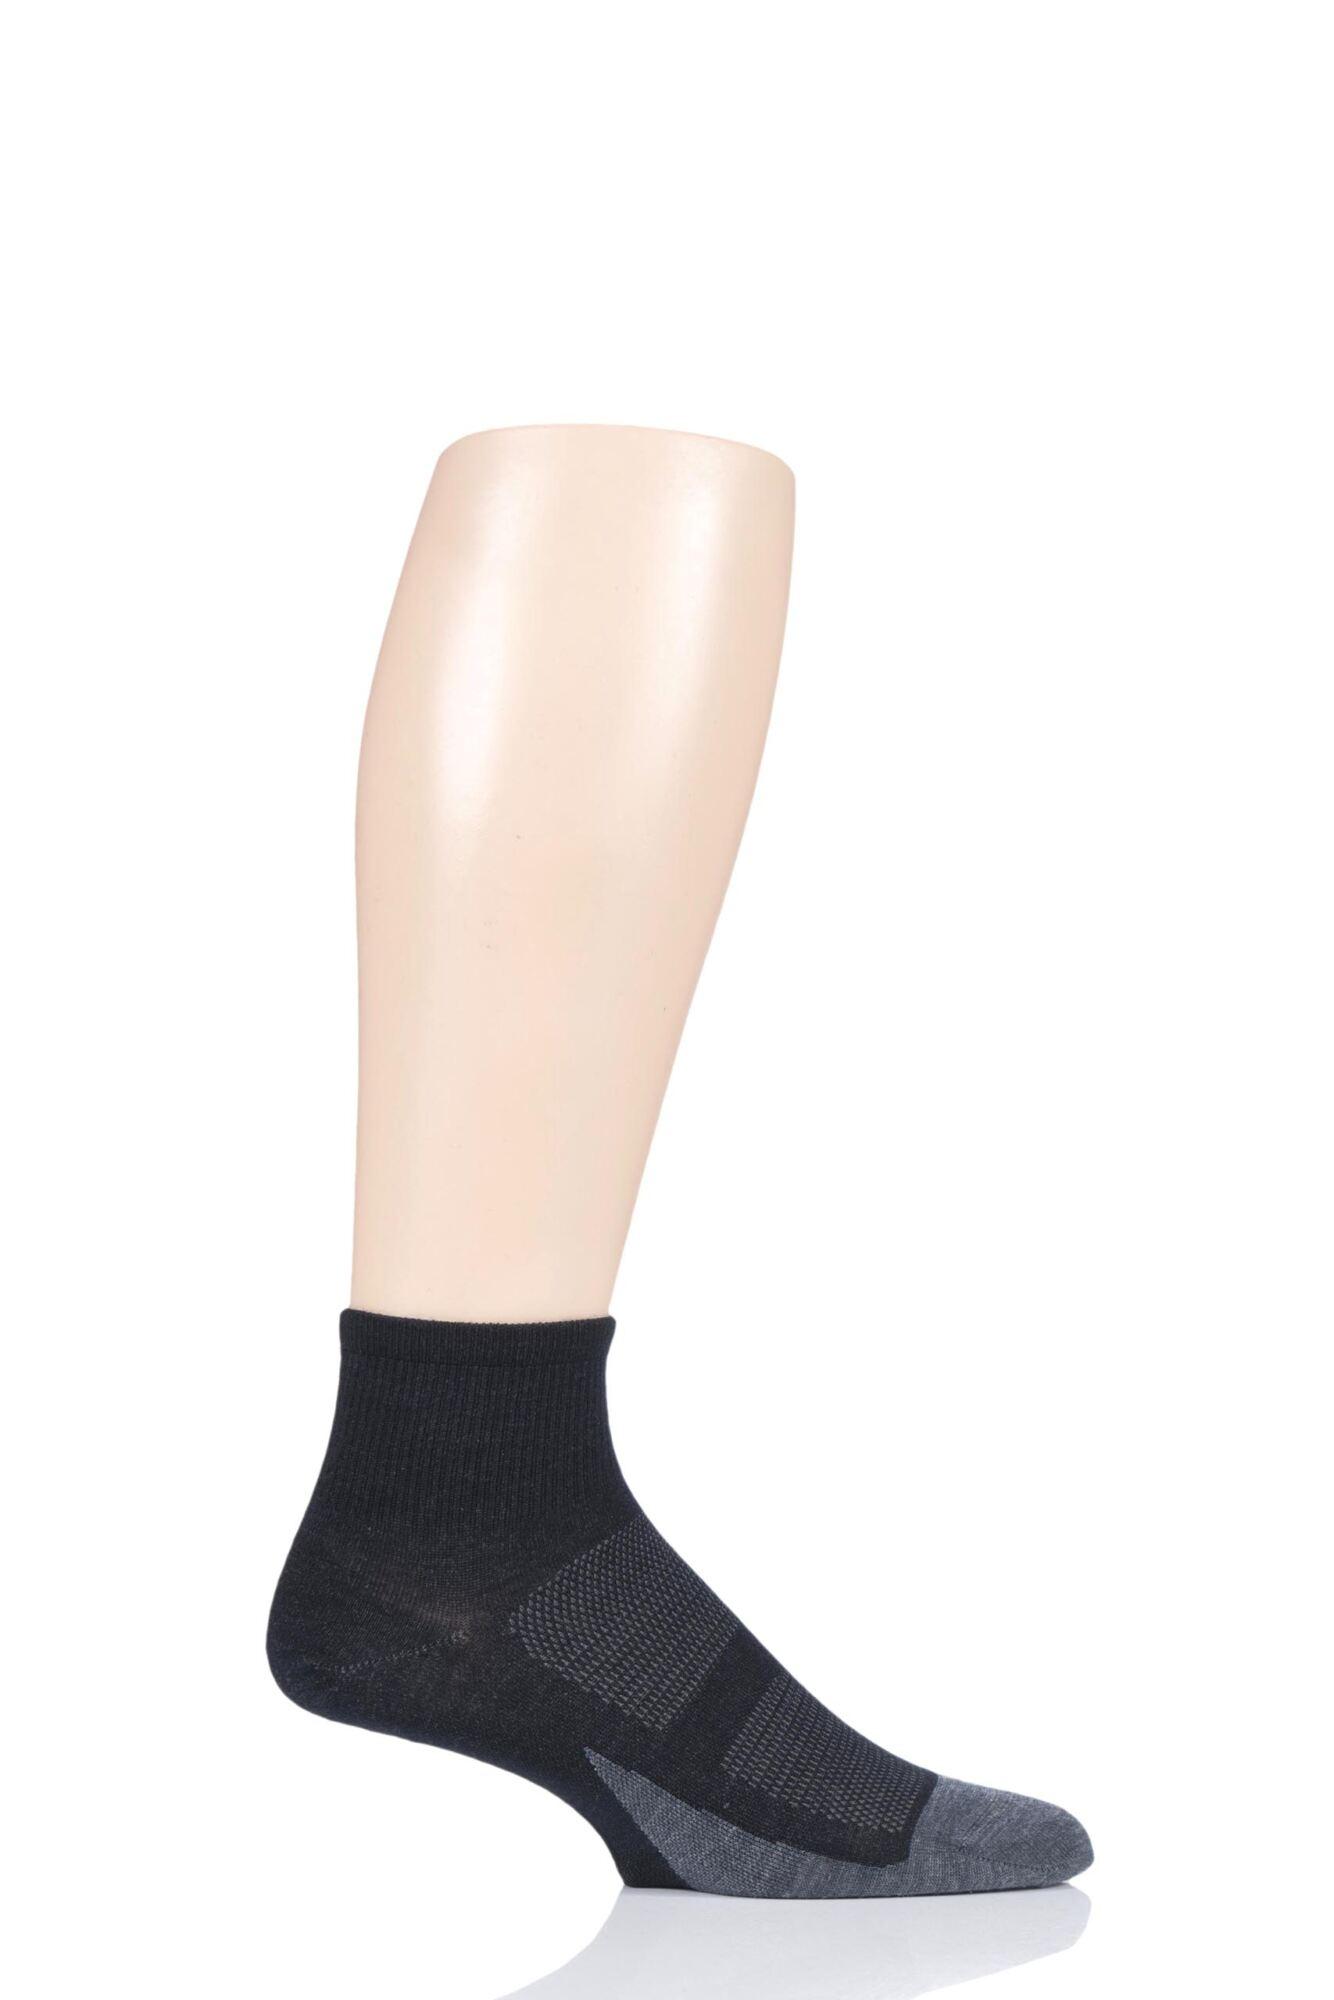 1 Pair Merino 10 Light Cushion Quarter Socks Unisex - Feetures